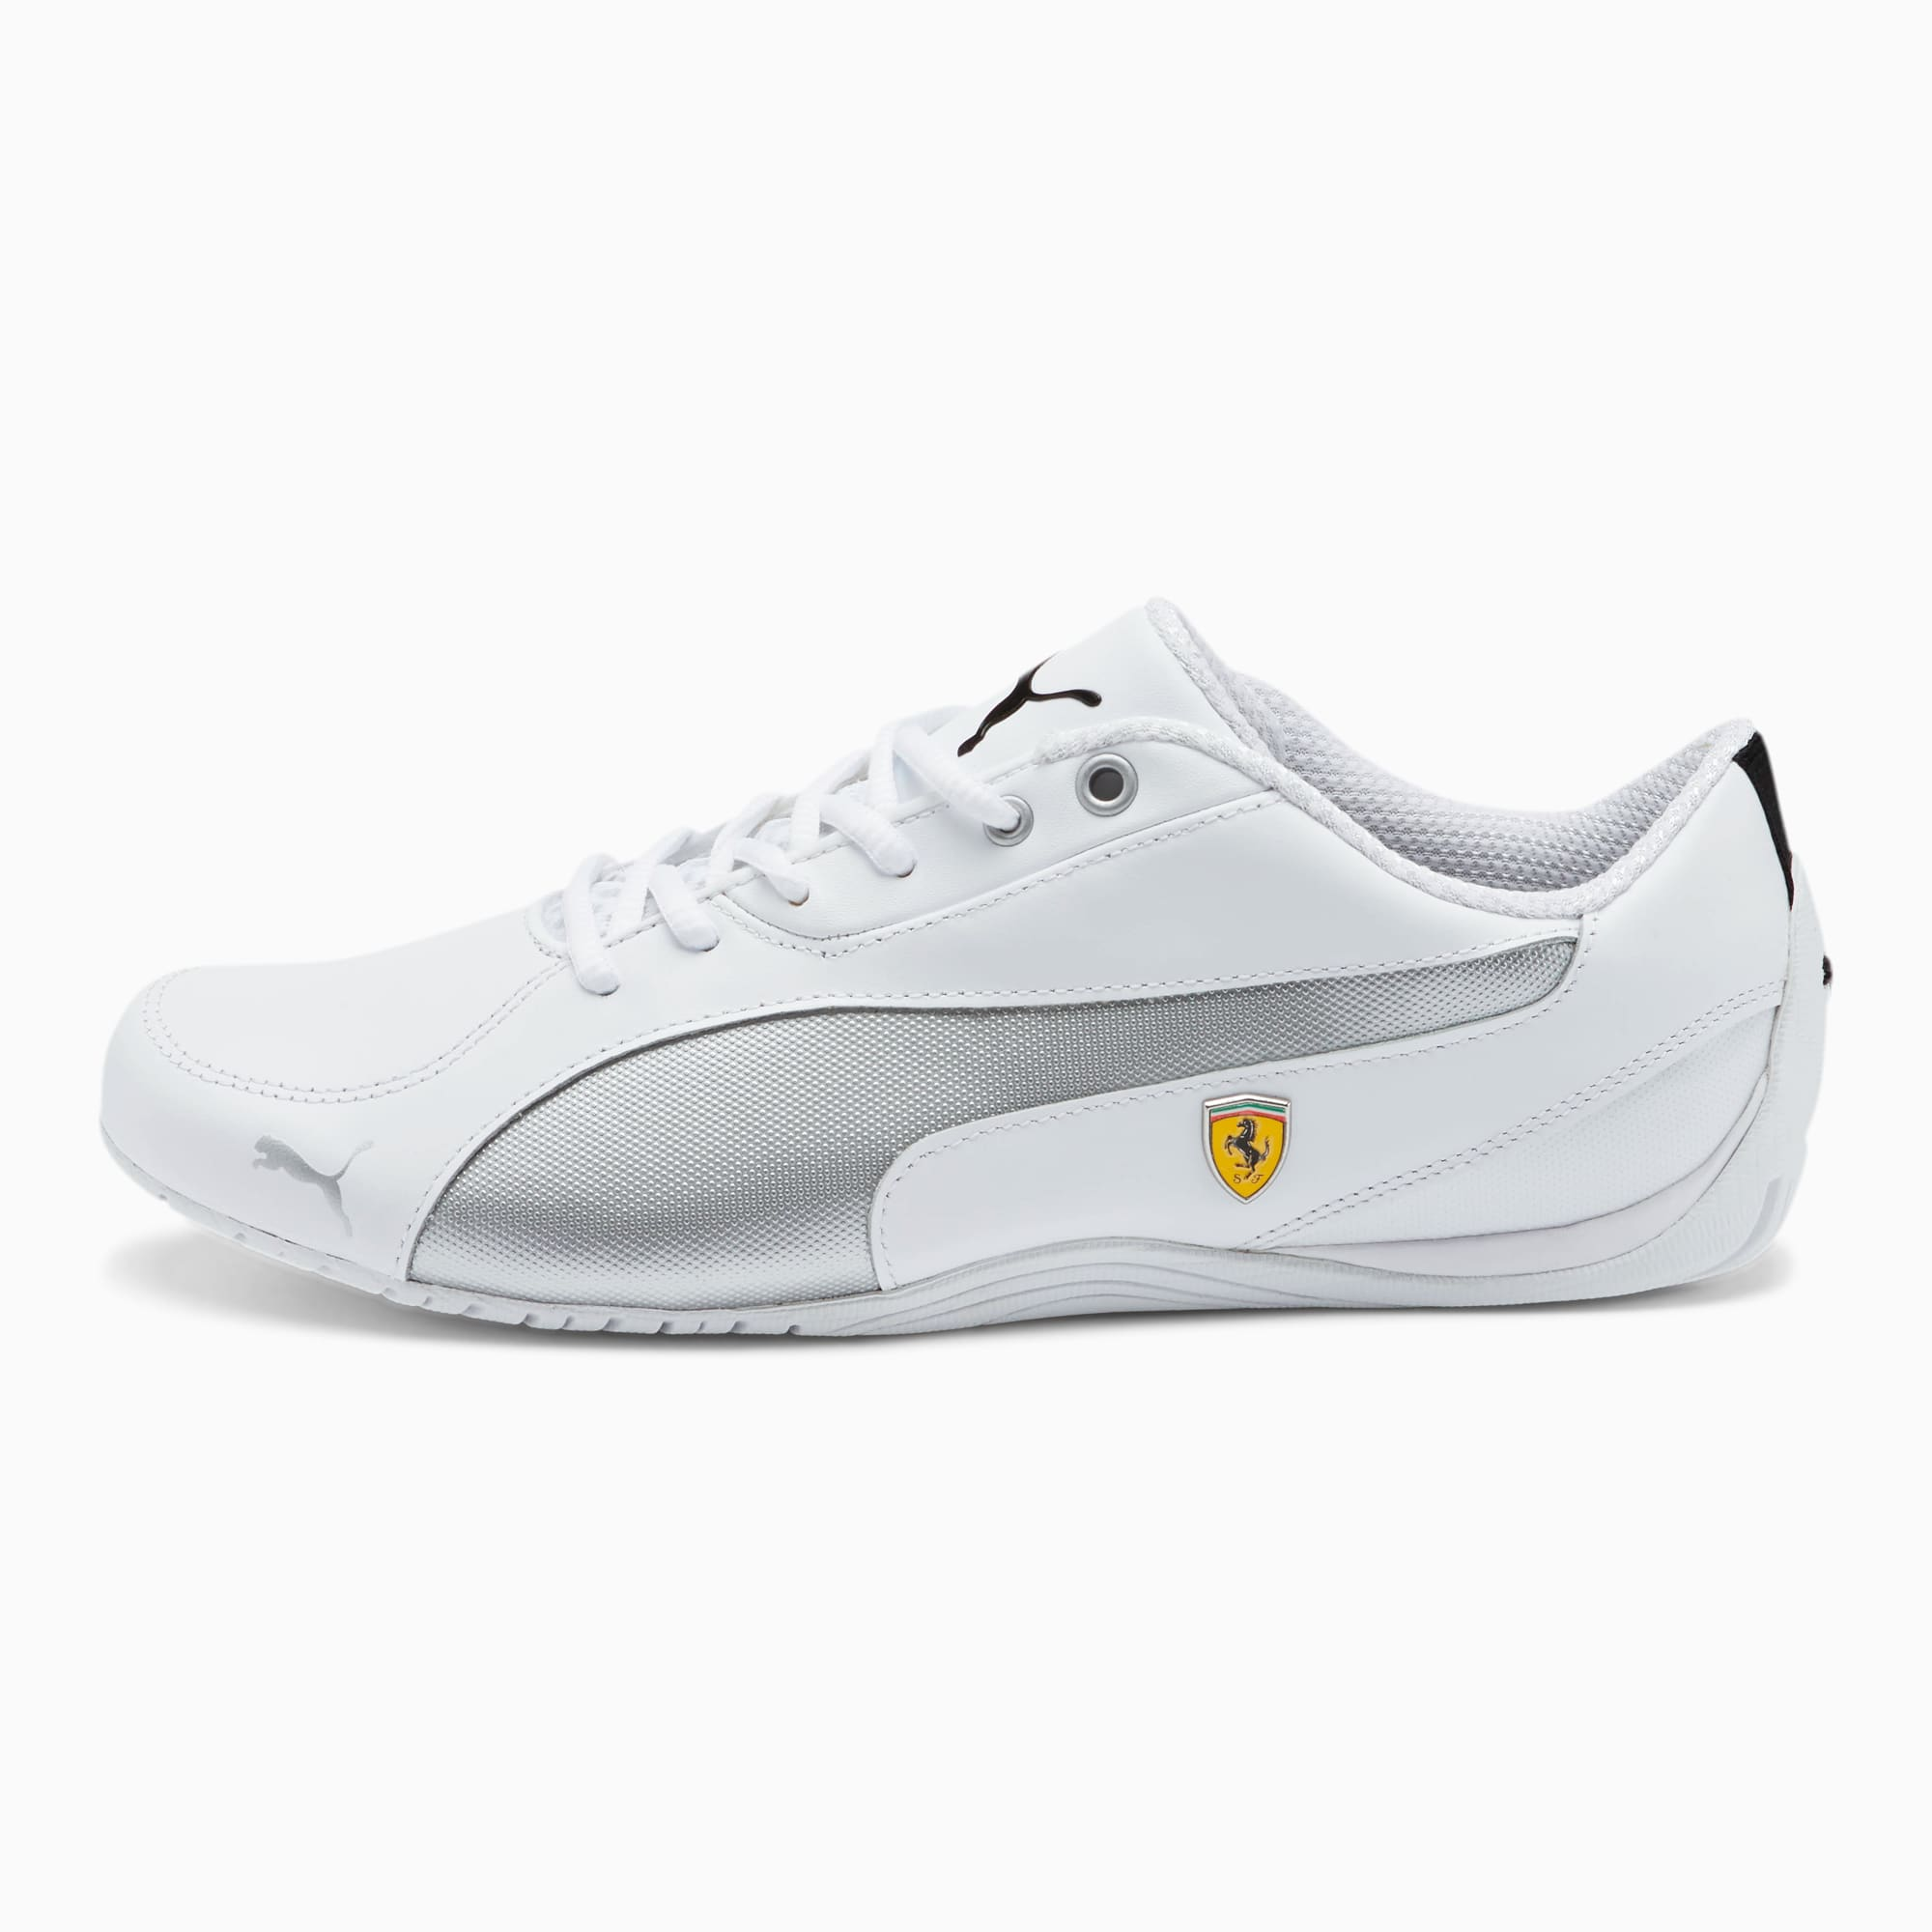 Scuderia Ferrari Drift Cat 5 NM Men's Shoes